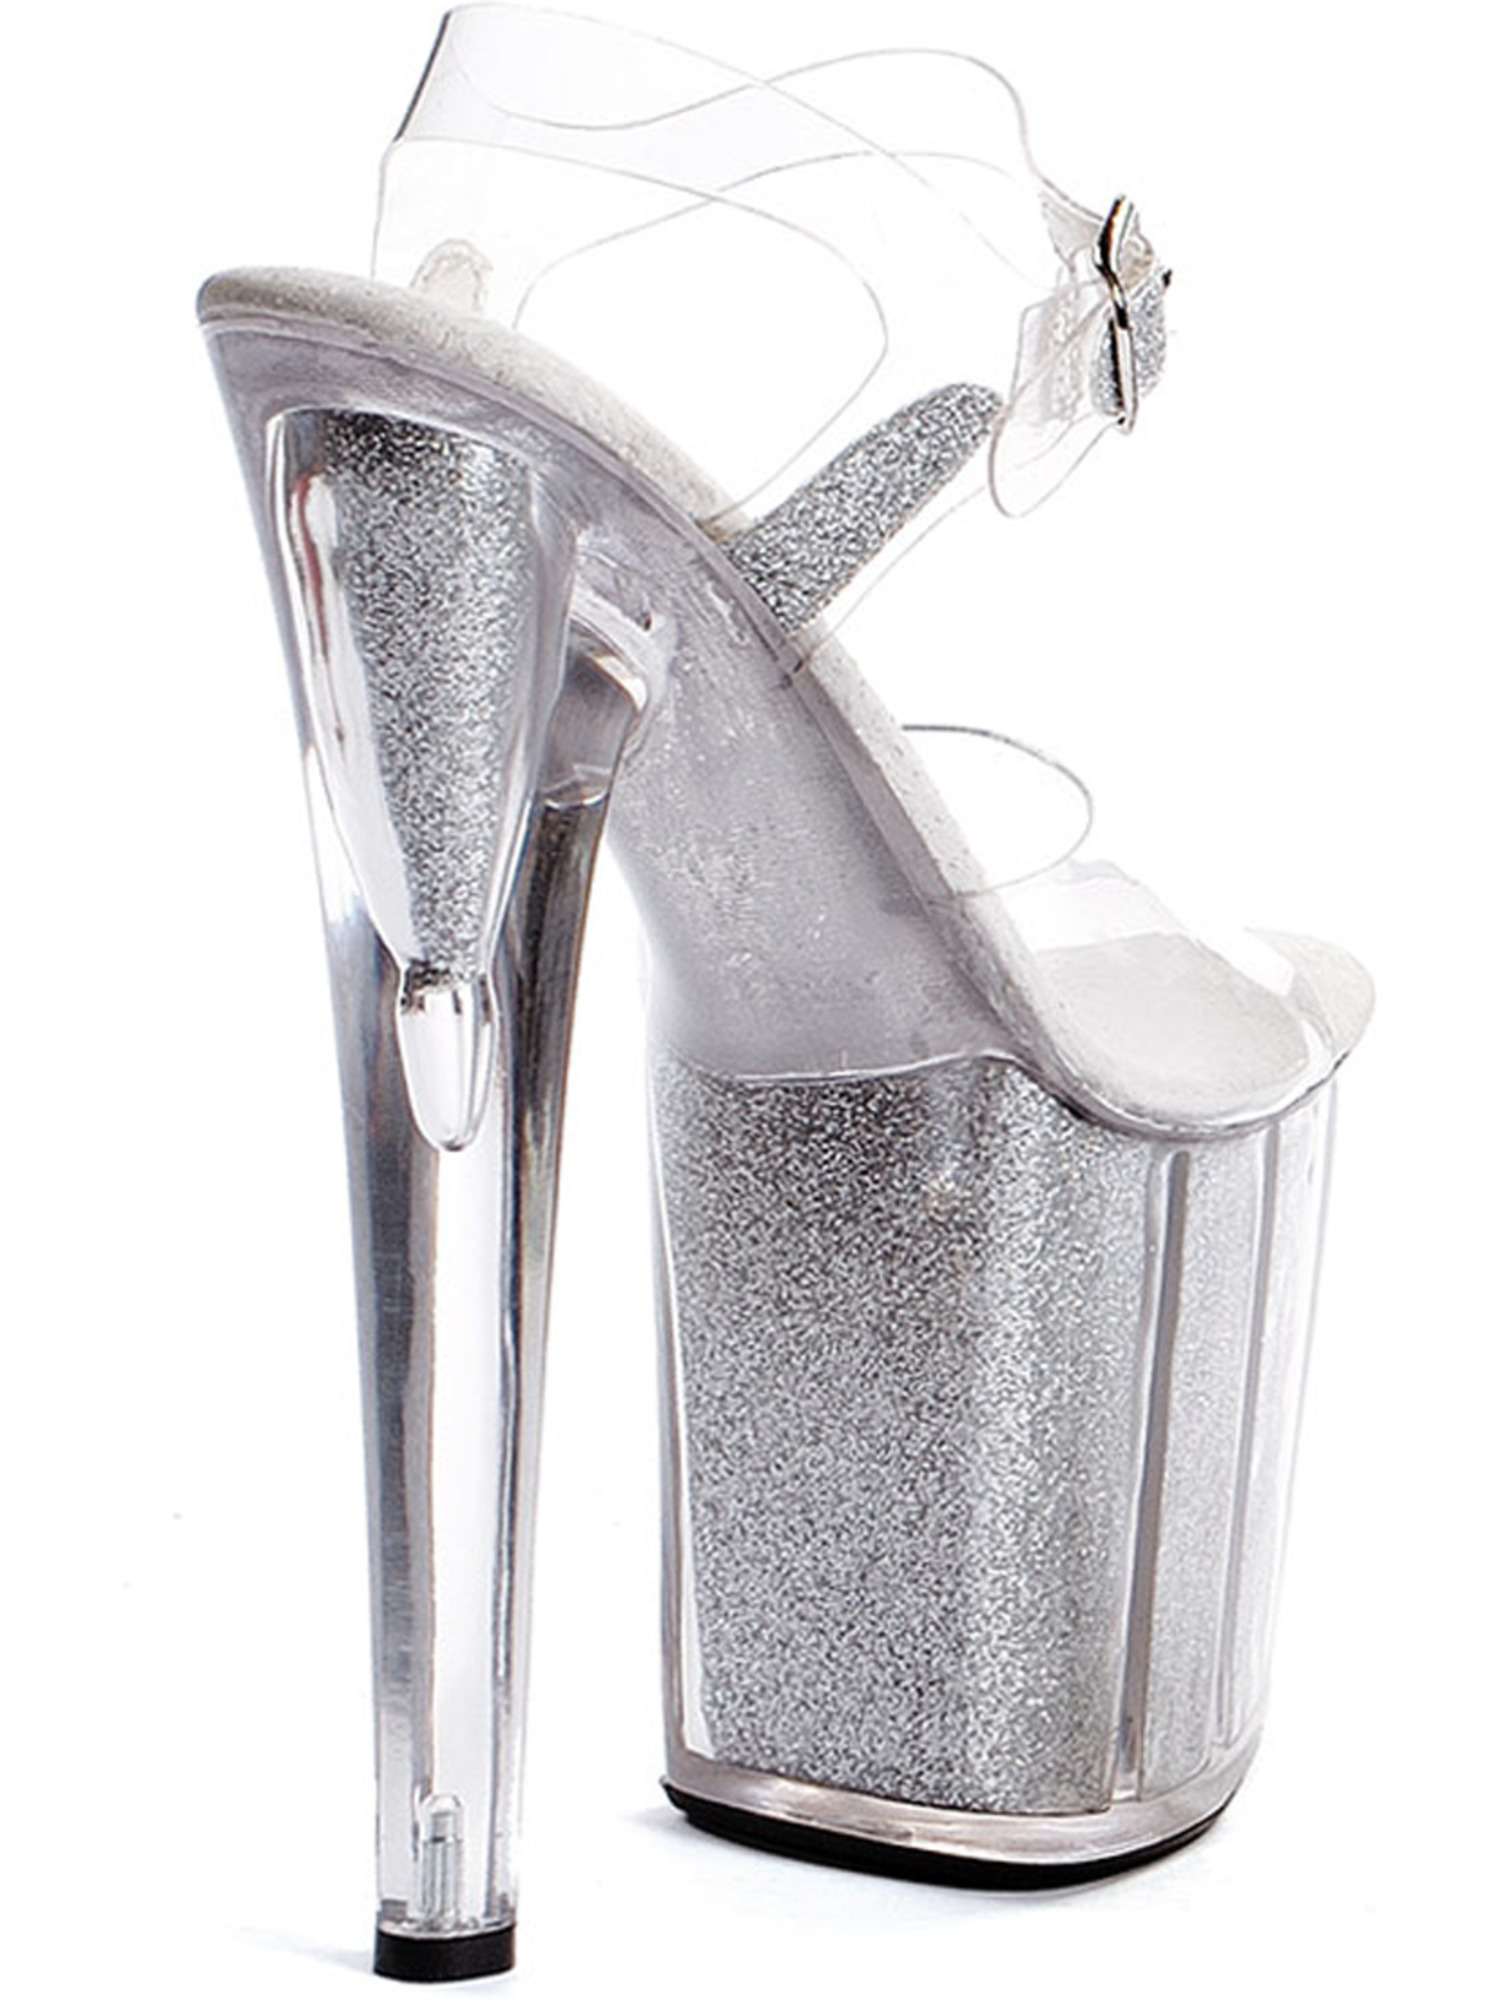 Women's Sexy High Platform Glitter Filled Sandal Shoes 8 Inch Dancer Shoes